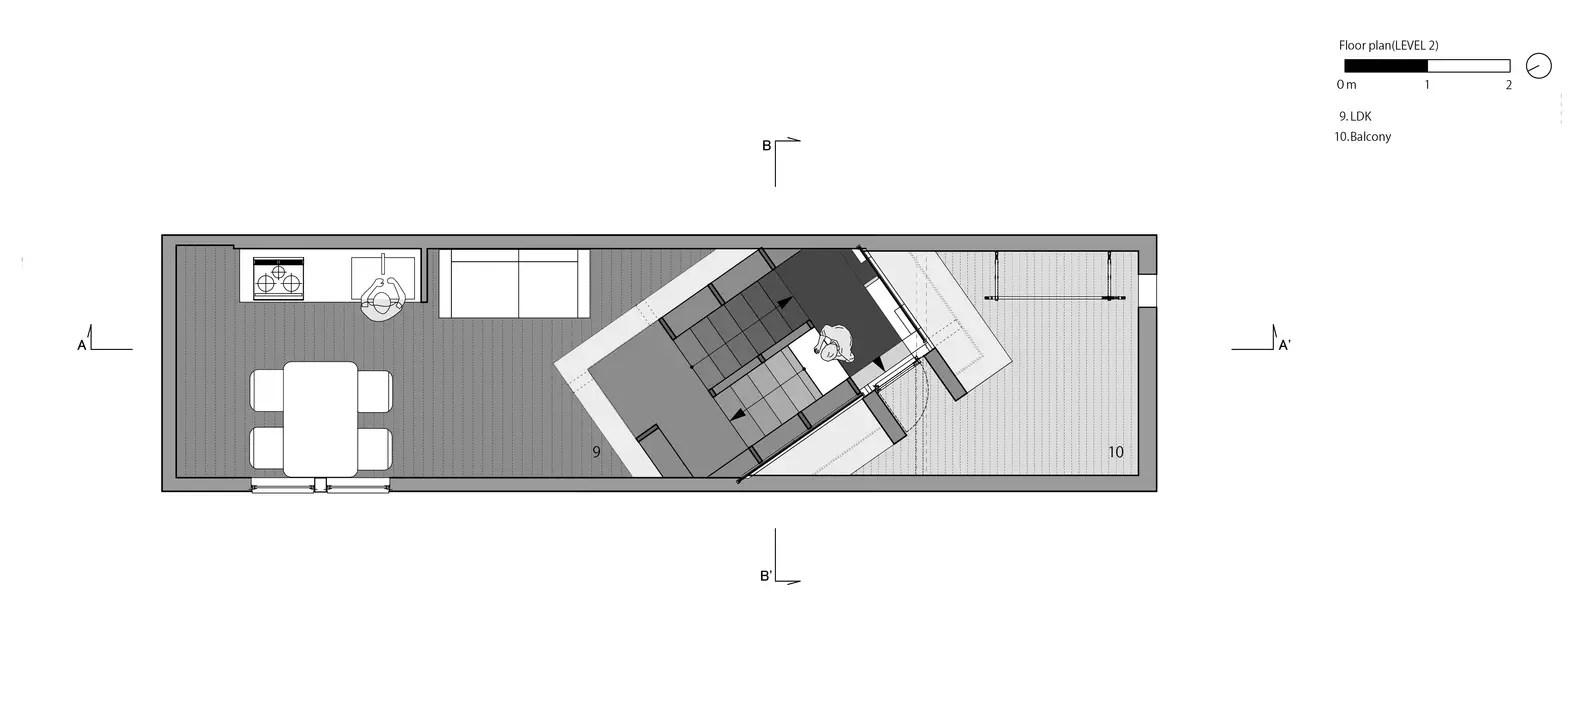 House_in_tezukayama_plan03_1f_level2_eng